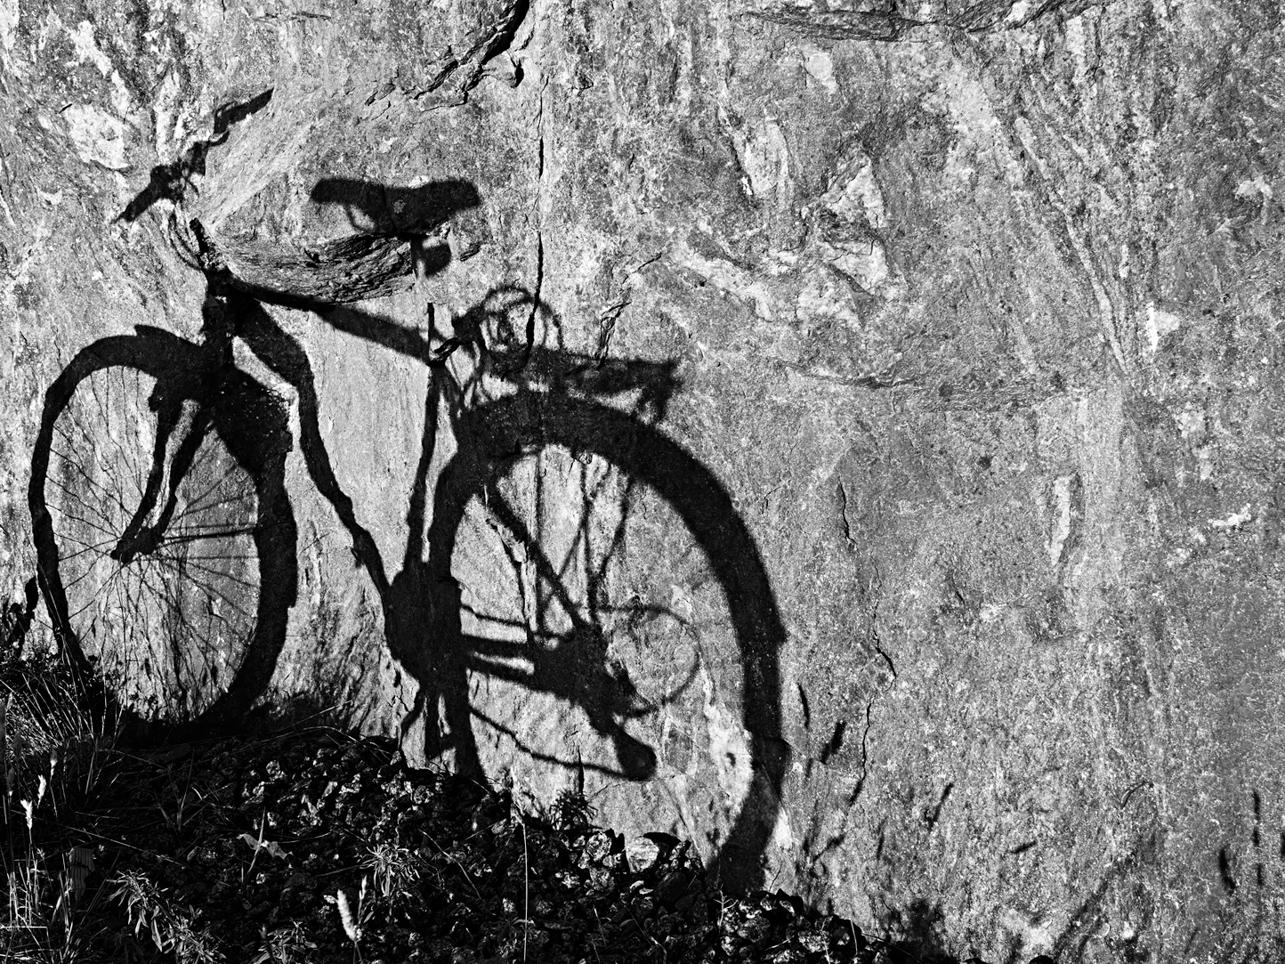 Foto: Leif Ljungquist. Cykelskugga.